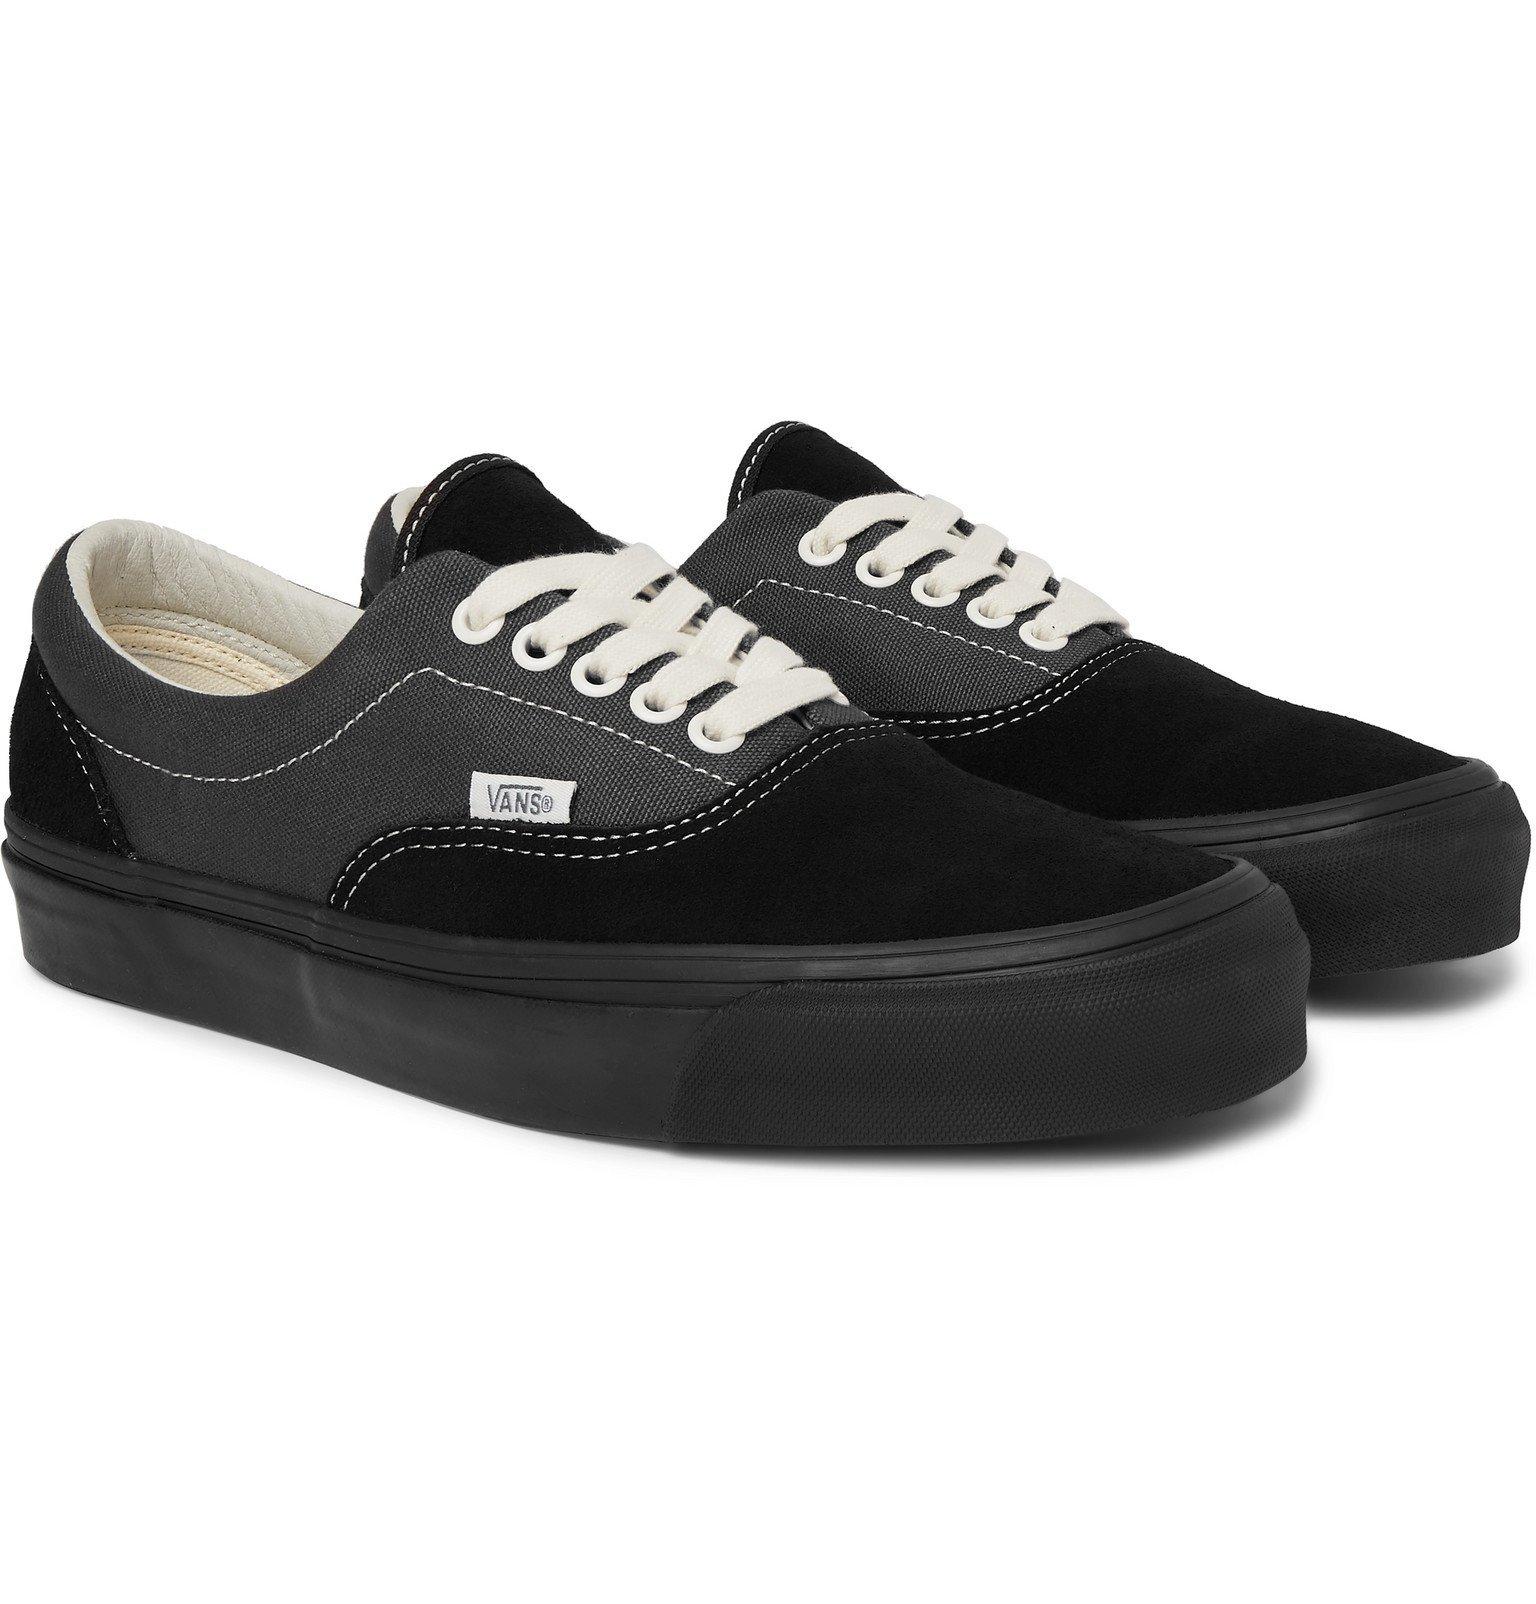 Photo: Vans - OG Era LX Colour-Block Canvas and Suede Sneakers - Black